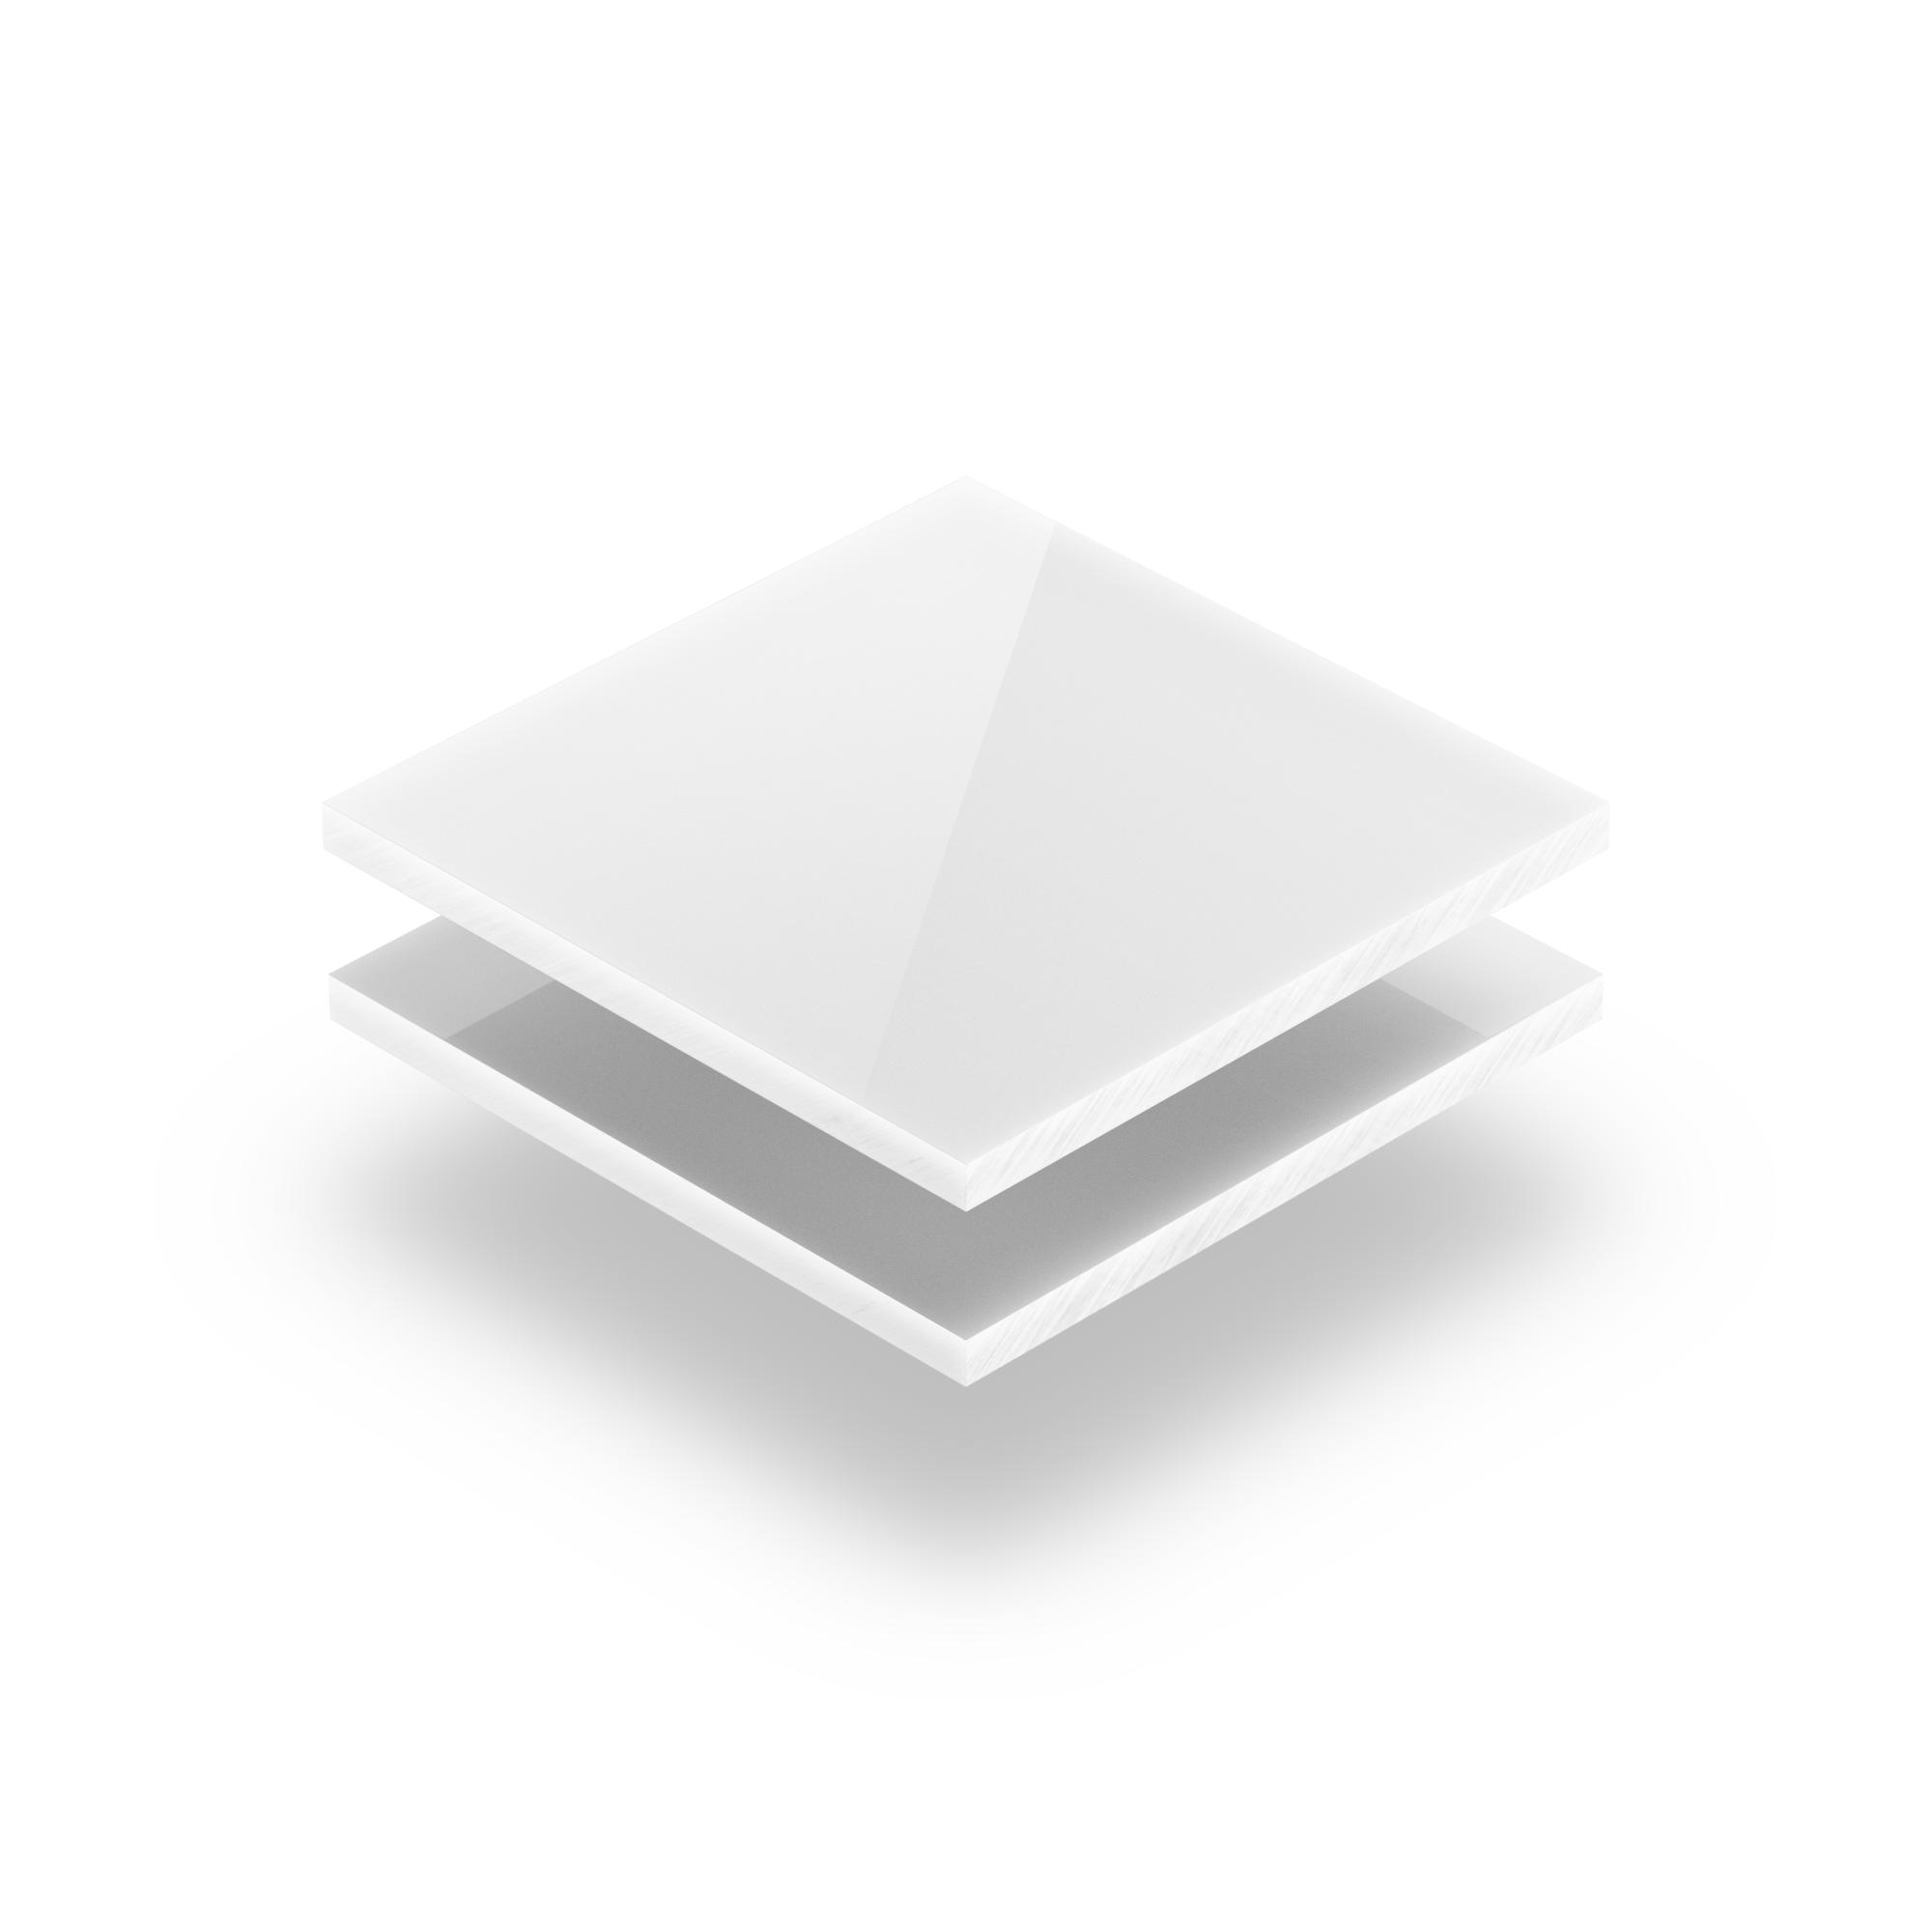 White opal extruded (XT) acrylic sheet 2 mm